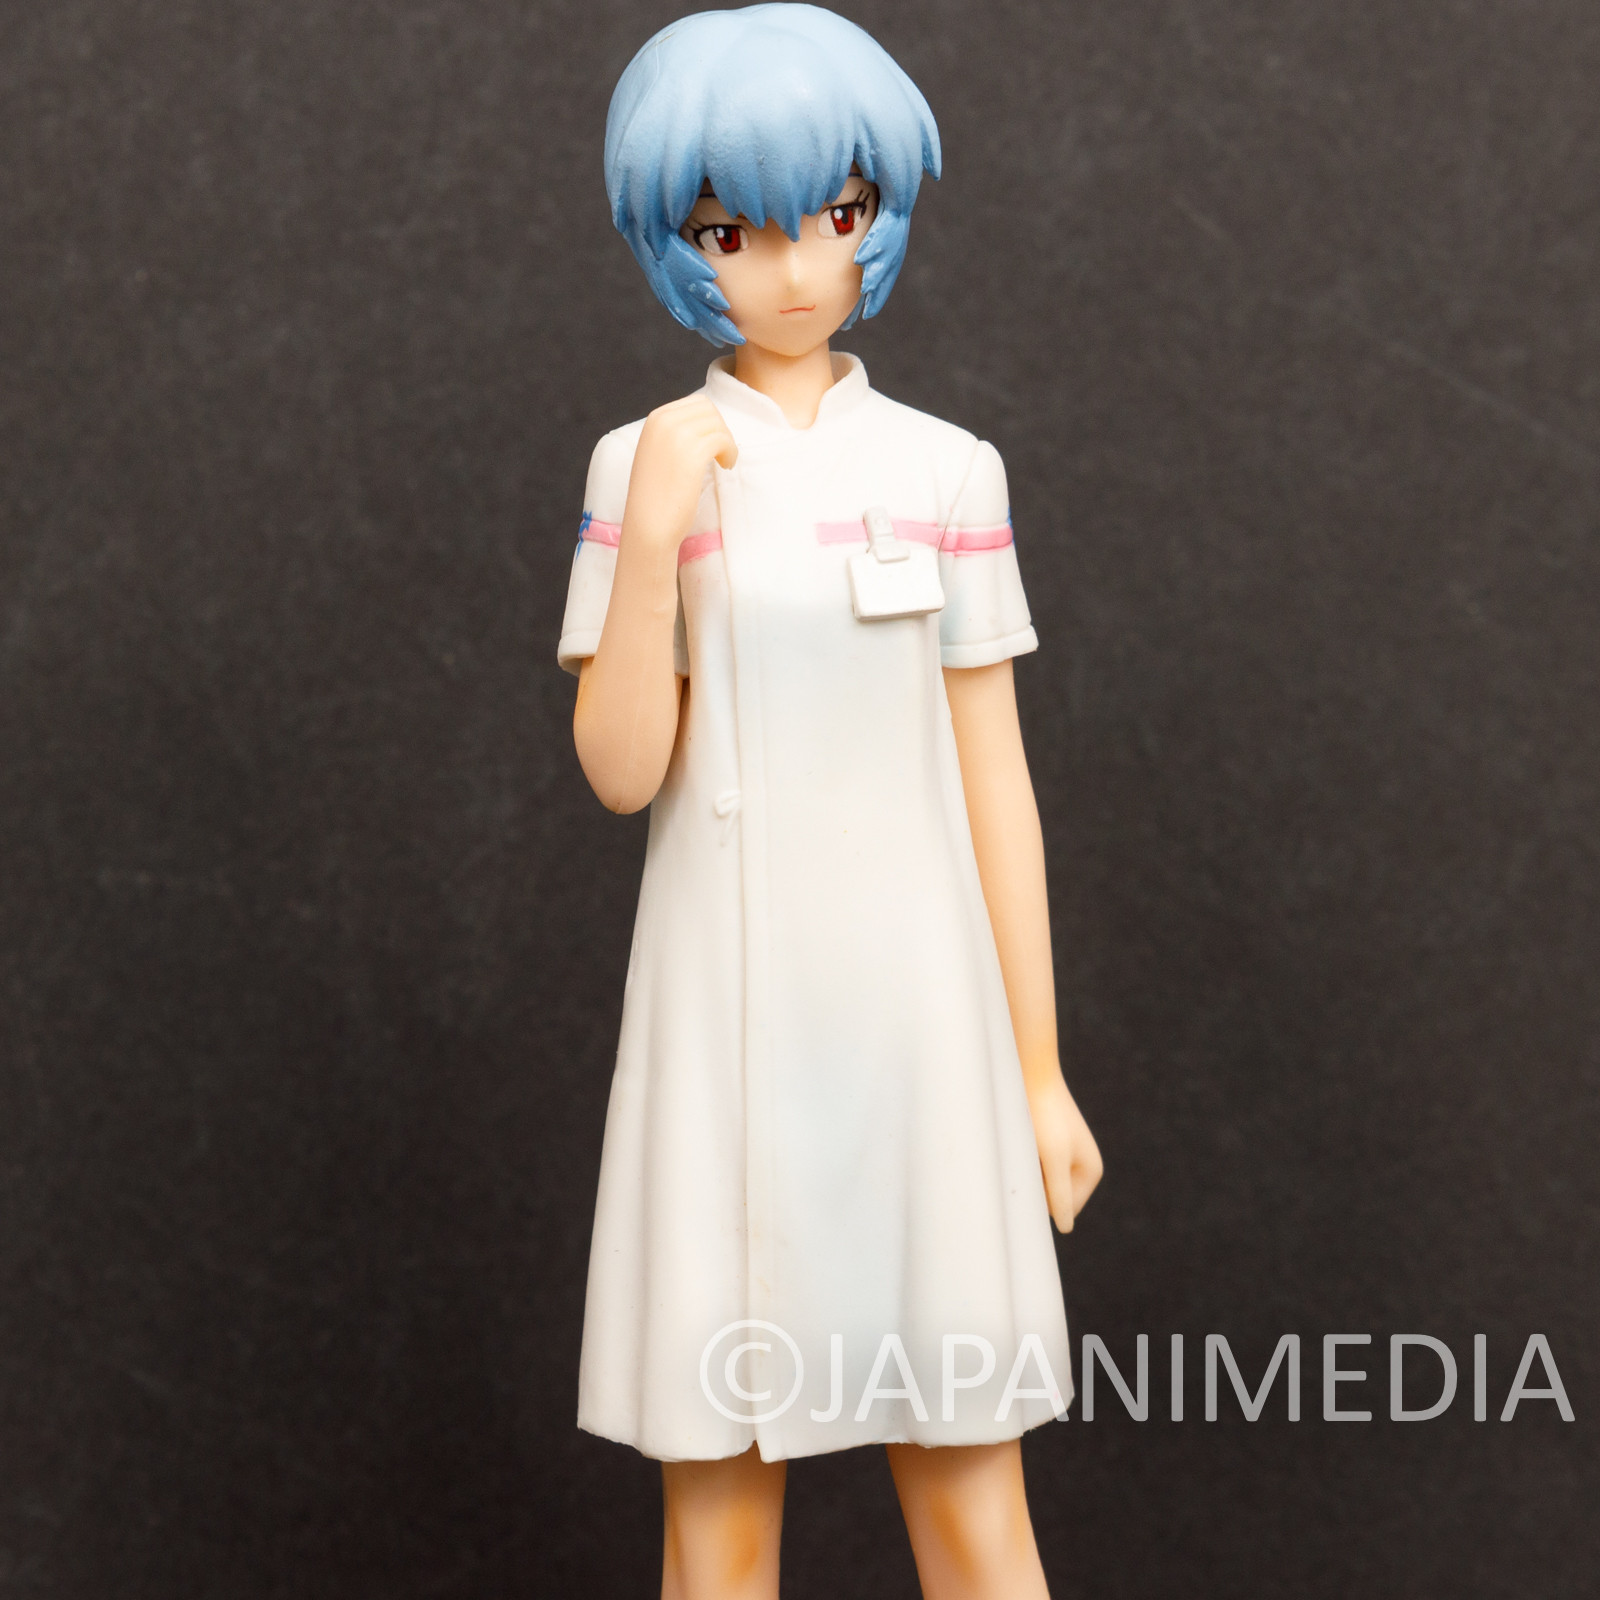 Evangelion Rei Ayanami White One Piece Portraits Figure Series 4 BANDAI JAPAN